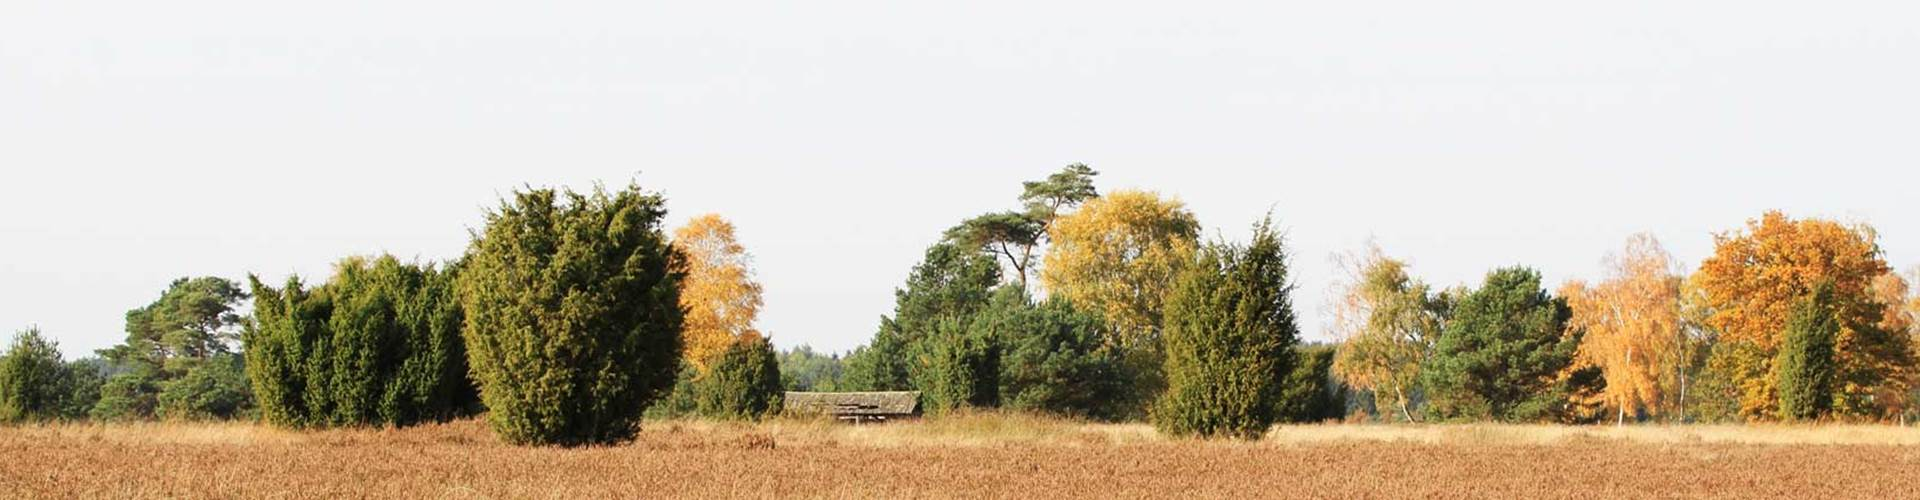 Heide im Herbst